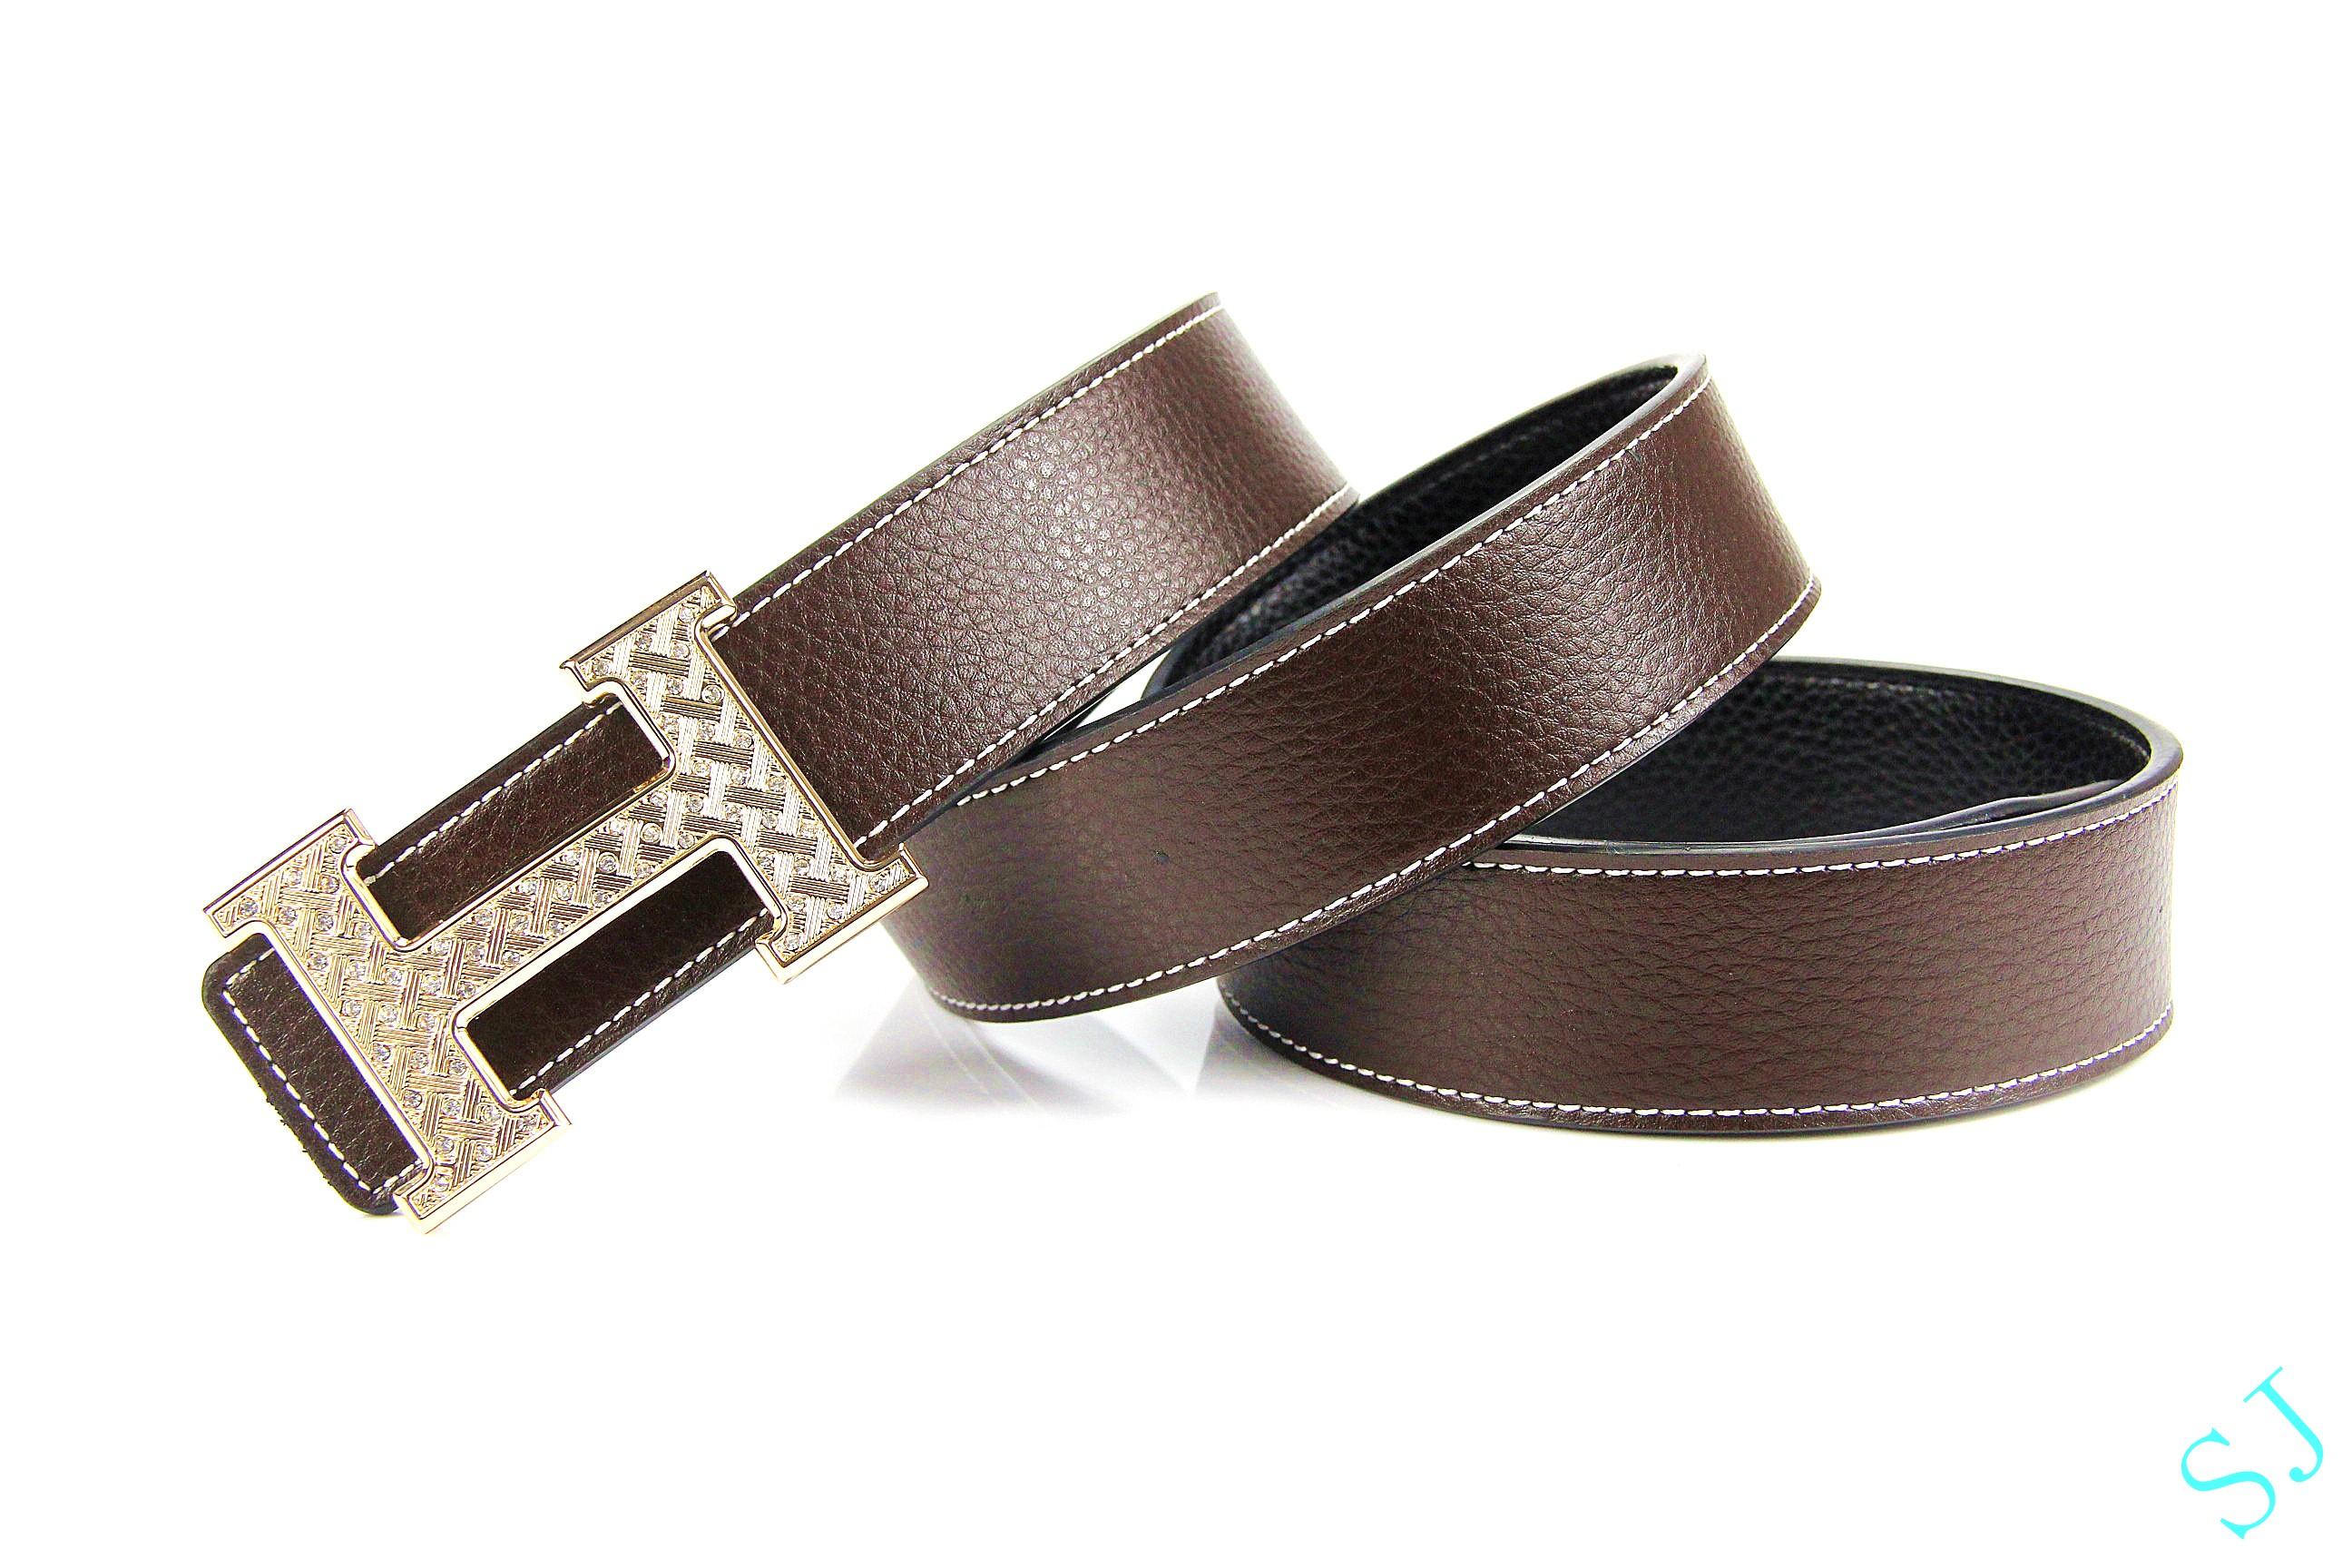 Hermes Belts Prices